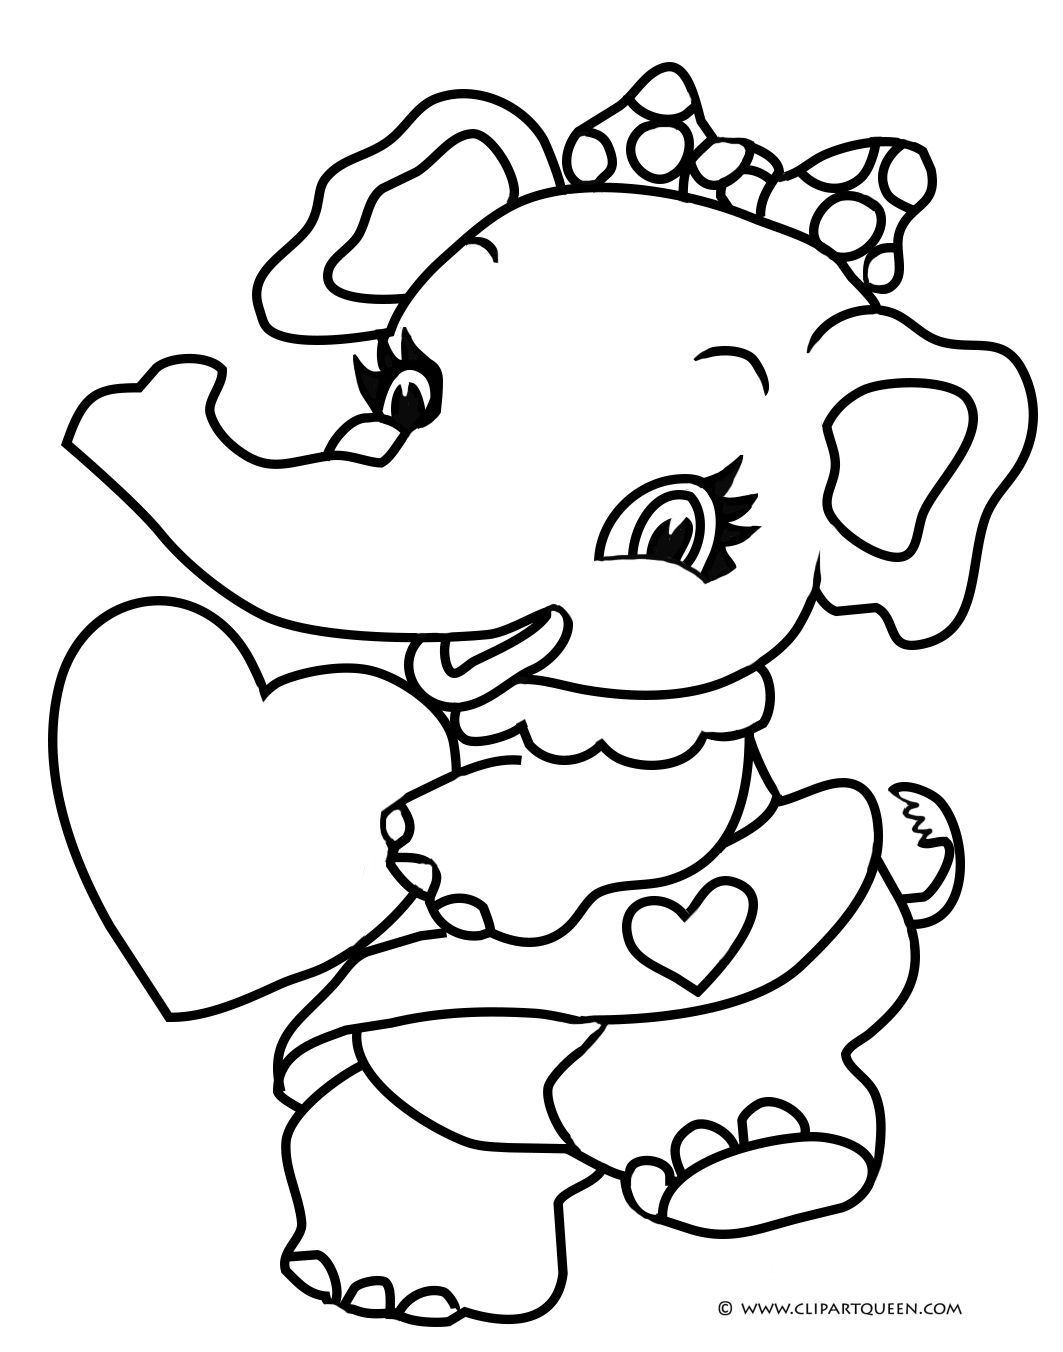 Cute Elephant Drawing At Getdrawings